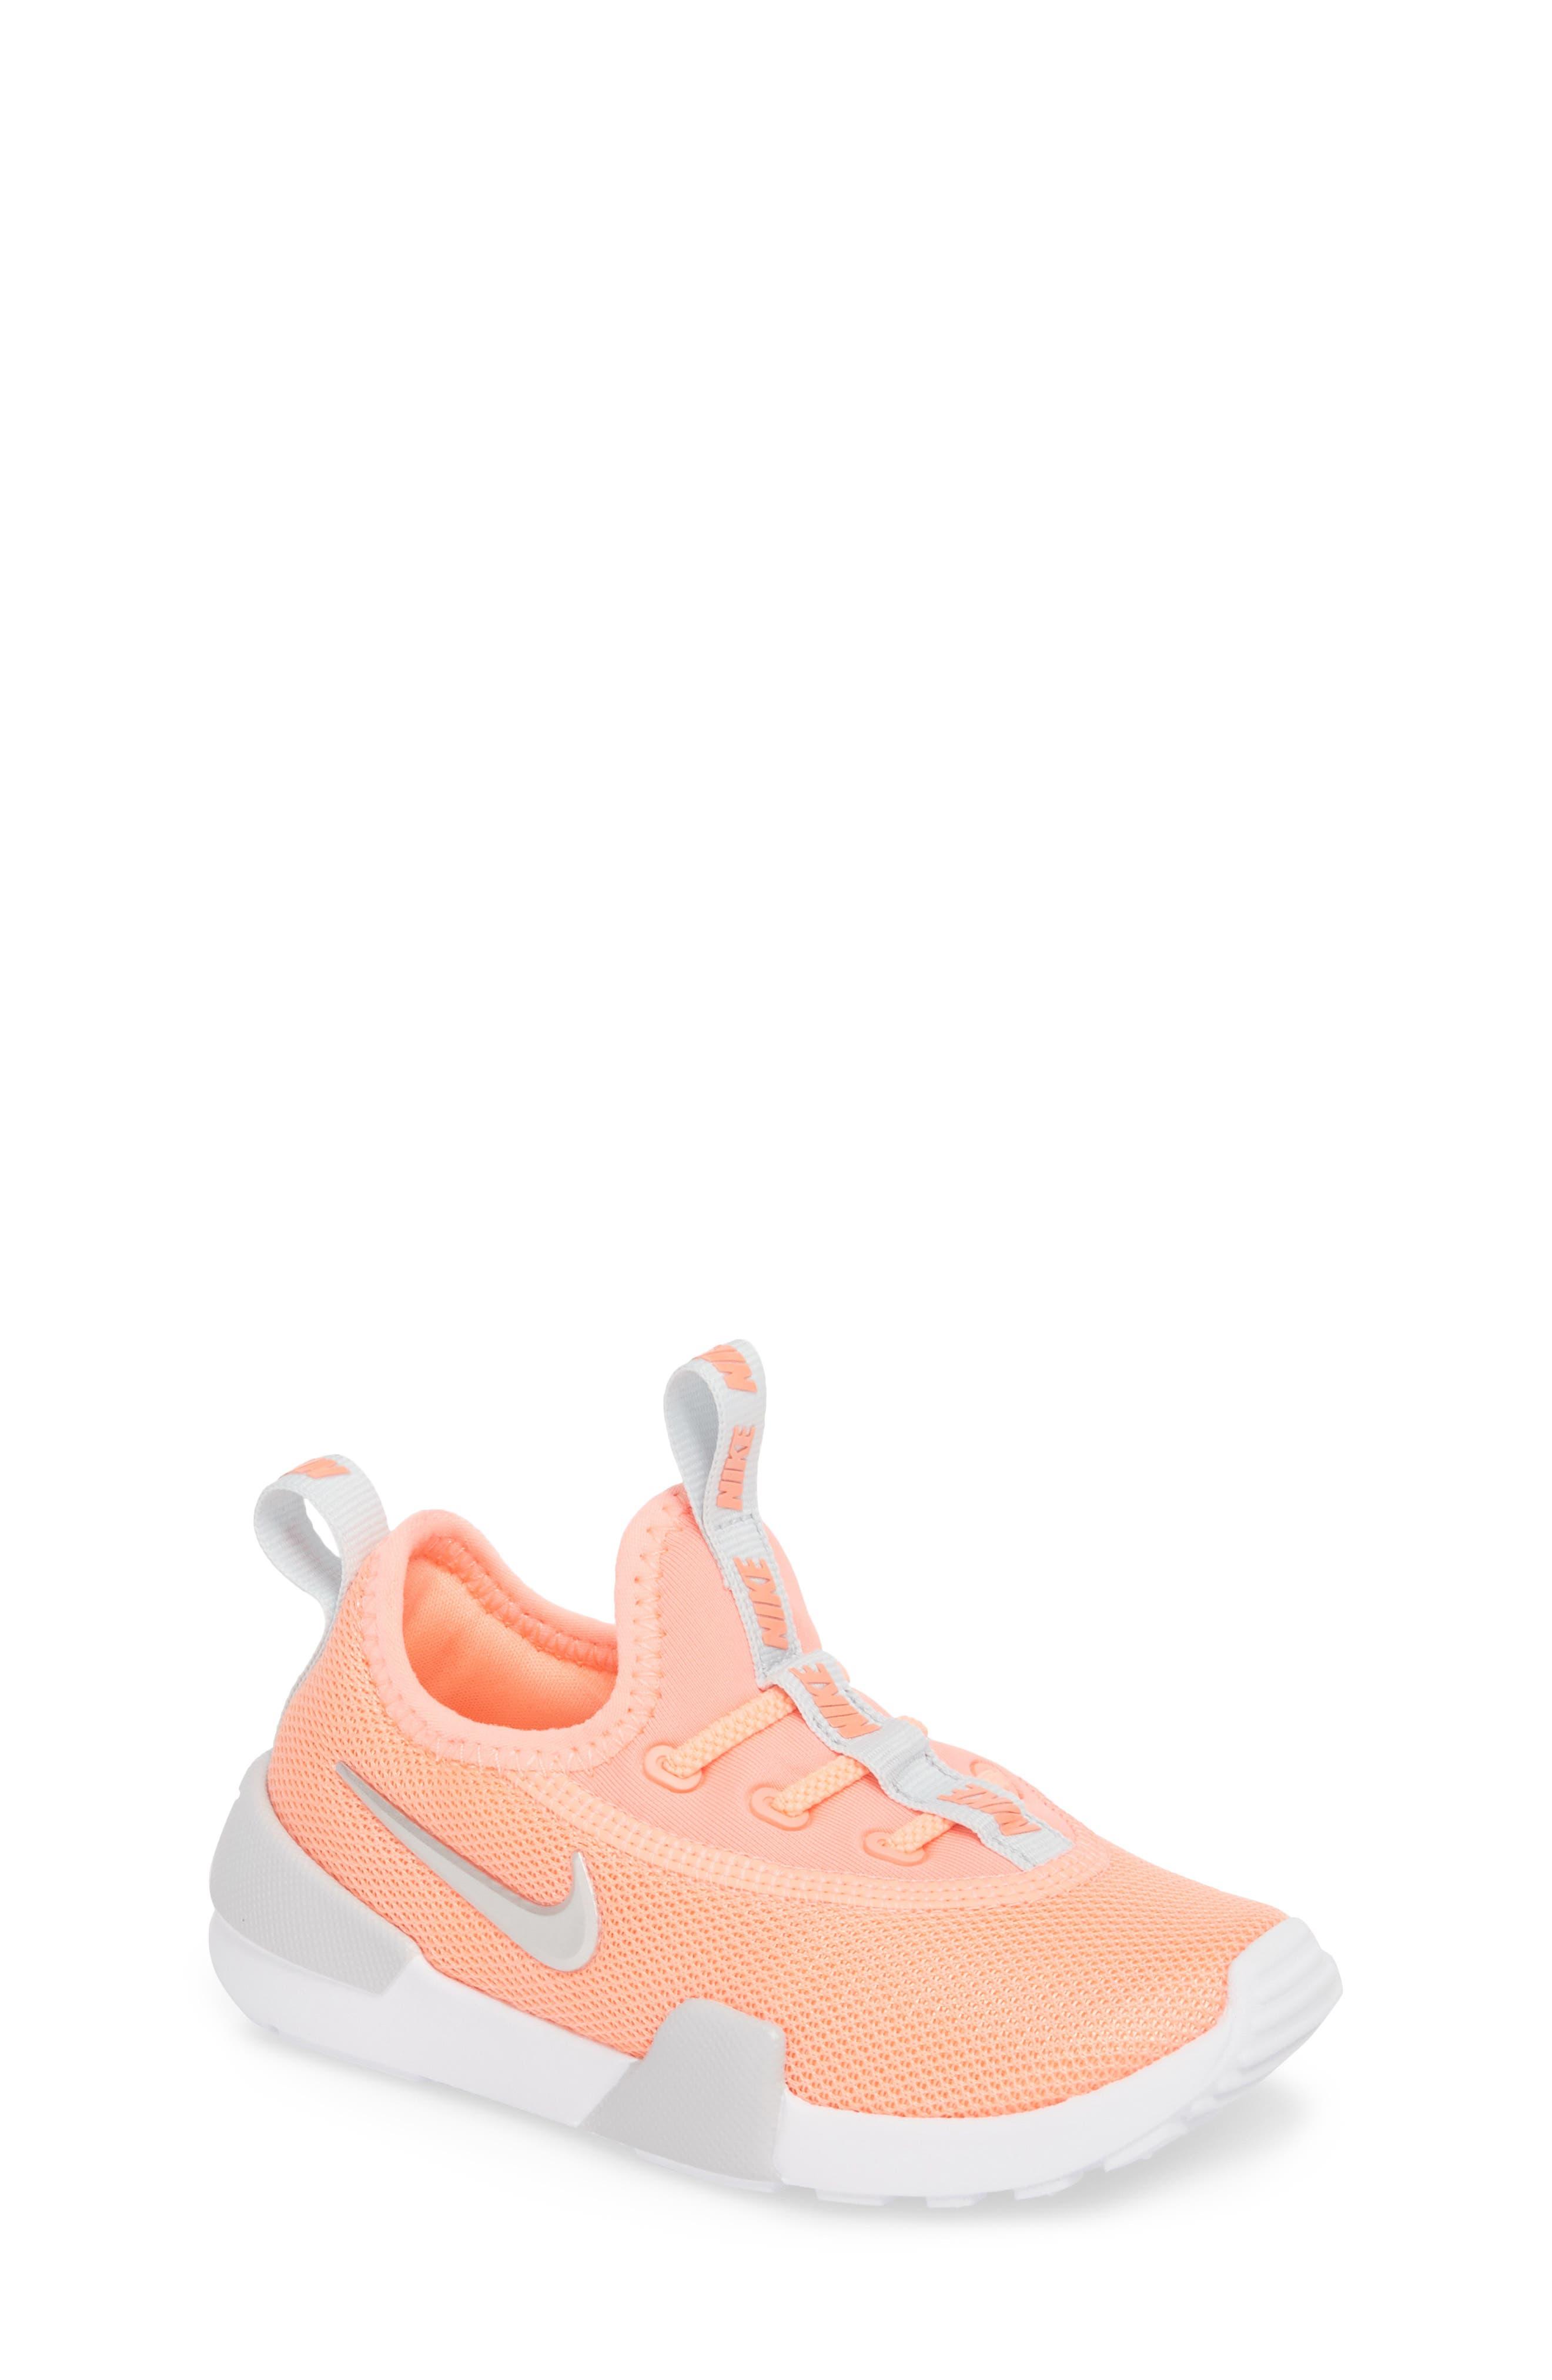 Ashin Modern Sock Knit Sneaker,                             Main thumbnail 1, color,                             ATOMIC PINK/ METALLIC SILVER